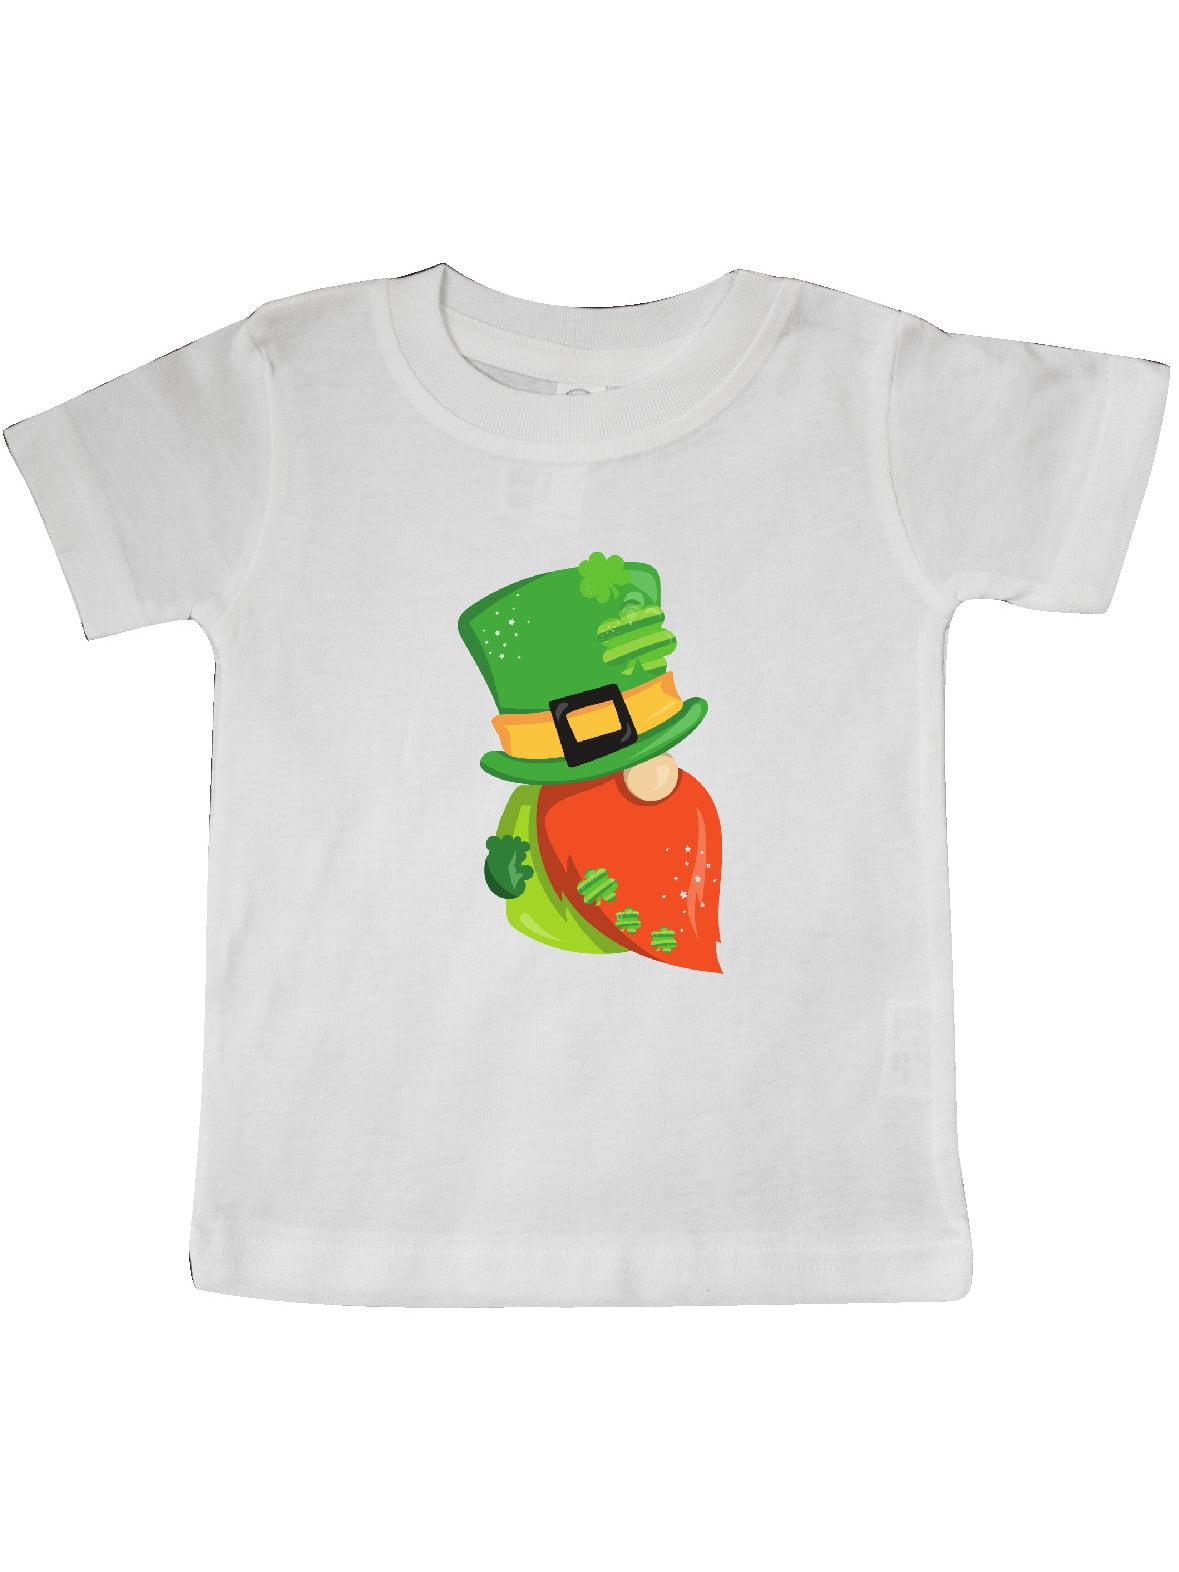 Download INKtastic - Saint Patrick's Day Gnome, Gnome With Orange ...